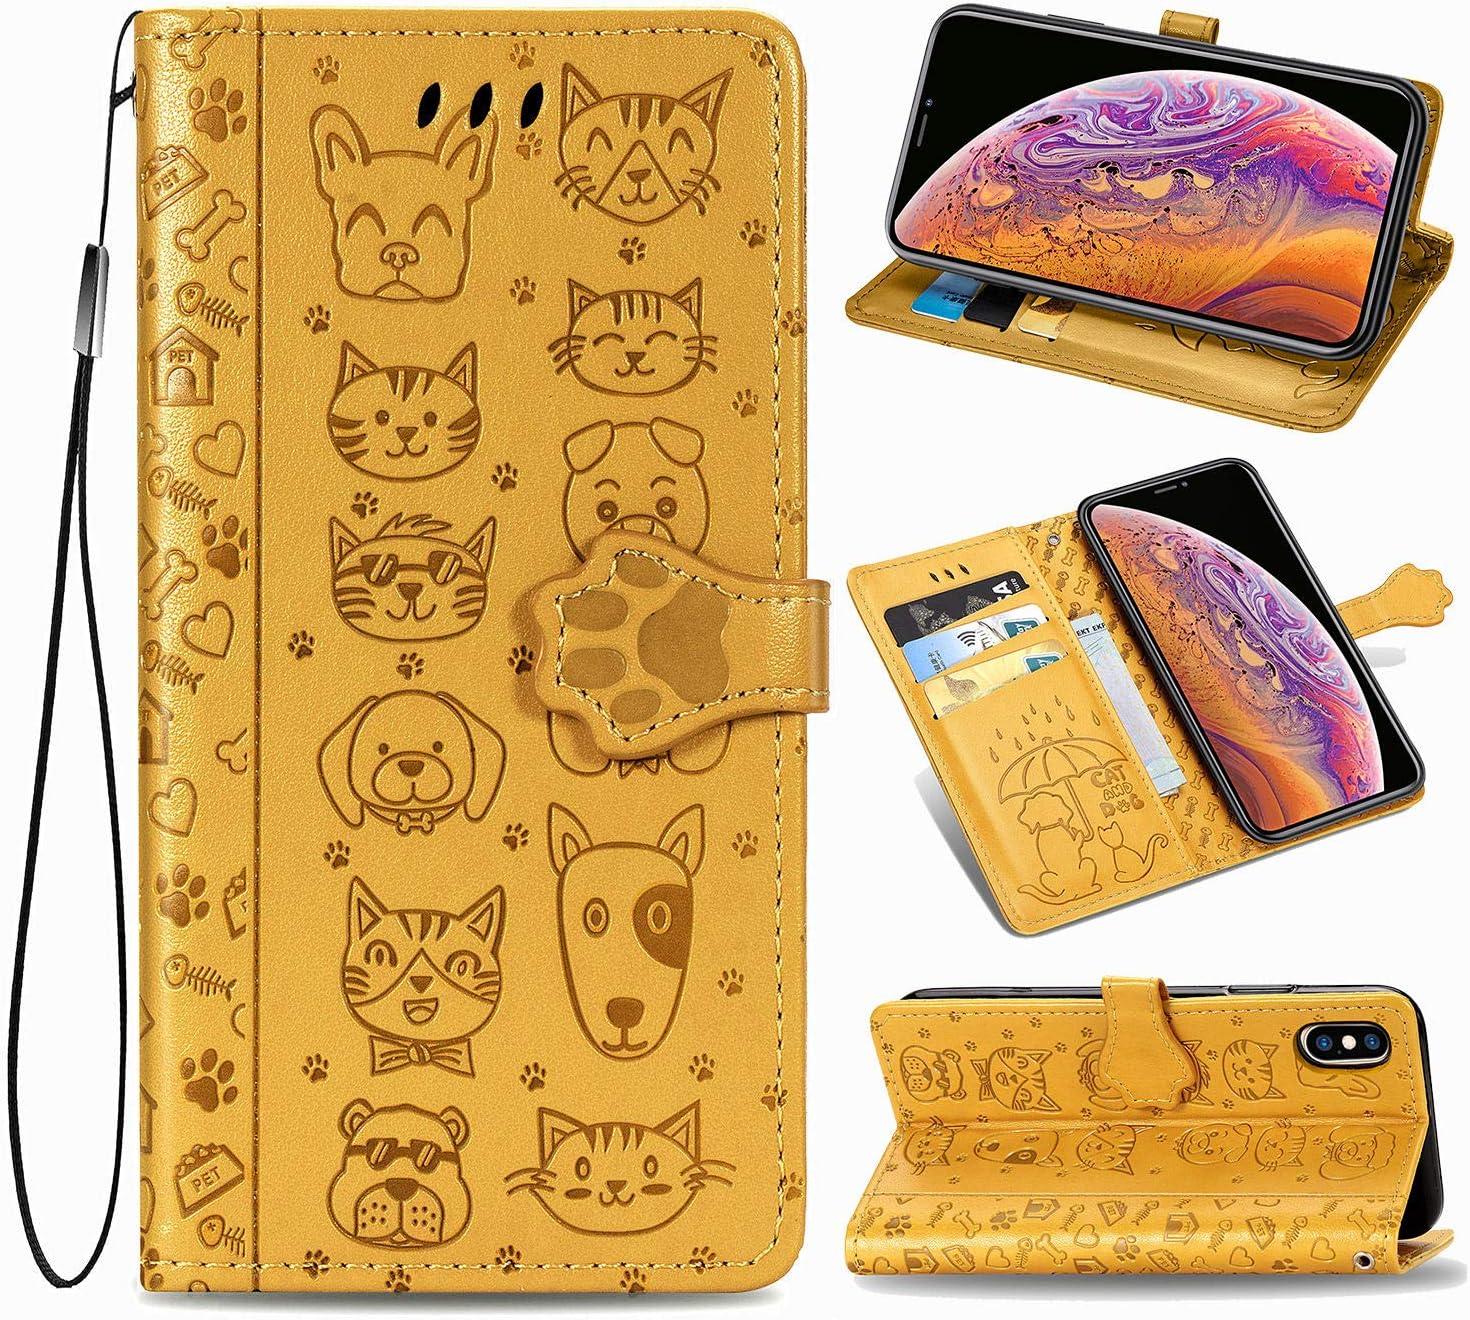 Oihxse Billetera Cuero Funda Compatible con Xiaomi Redmi 8 PU Libro Tapa Flip Soporte Plegable Protector Magnético Carcasa Gato Perro Lindo Animal Diseño Wallet Case-Amarillo